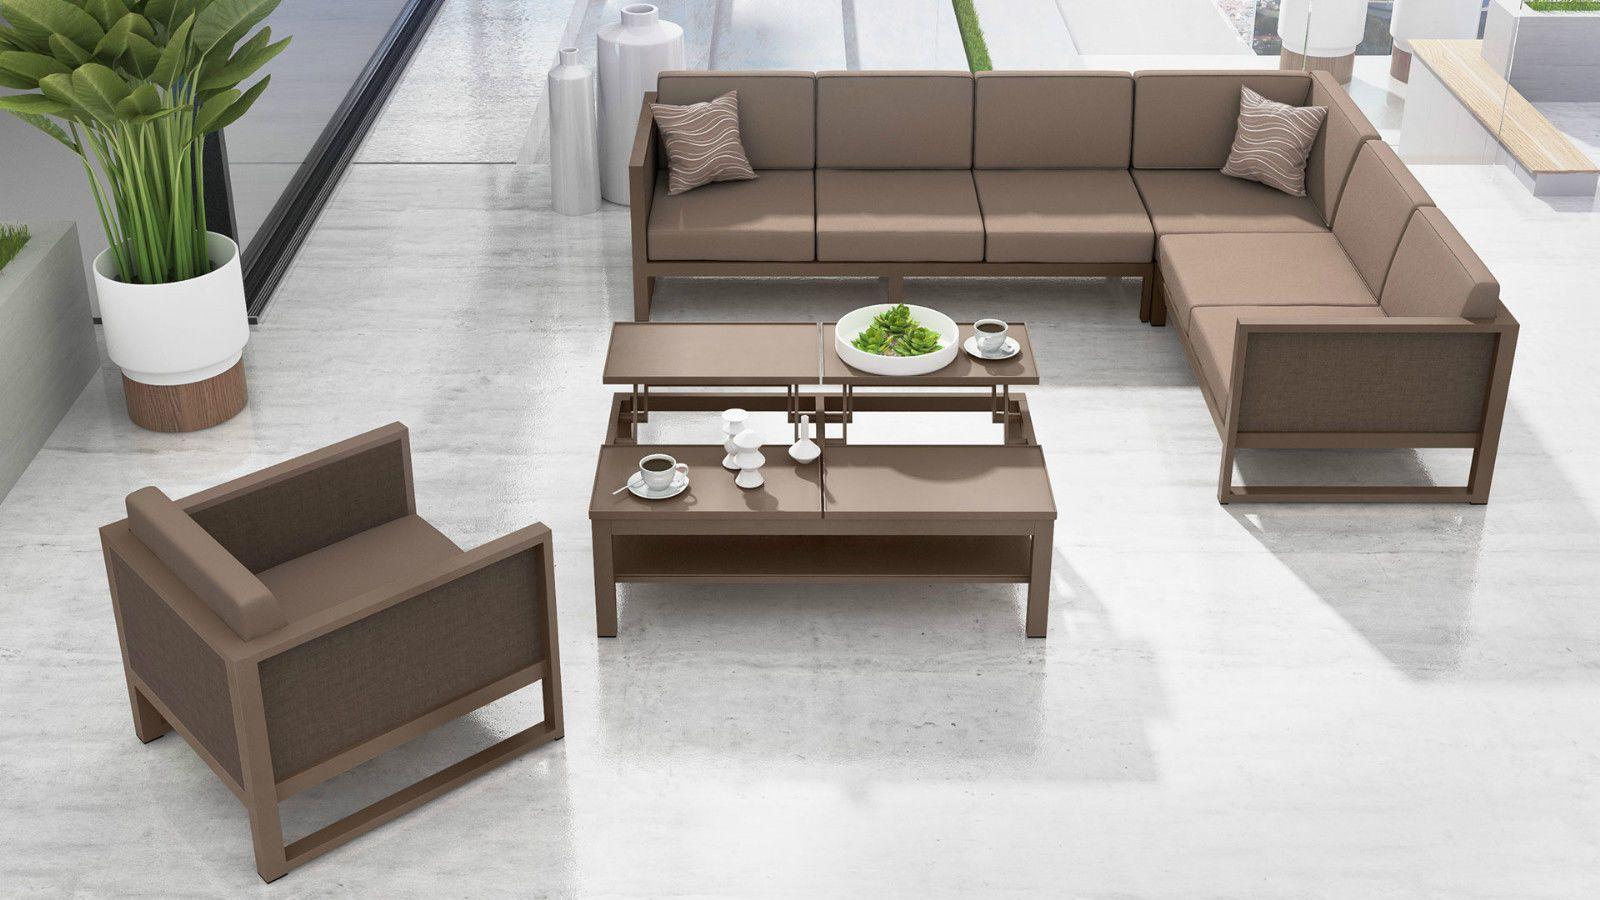 gartenmöbel aluminium sitzgruppe lounge murano 265x205 cm taupe, Möbel